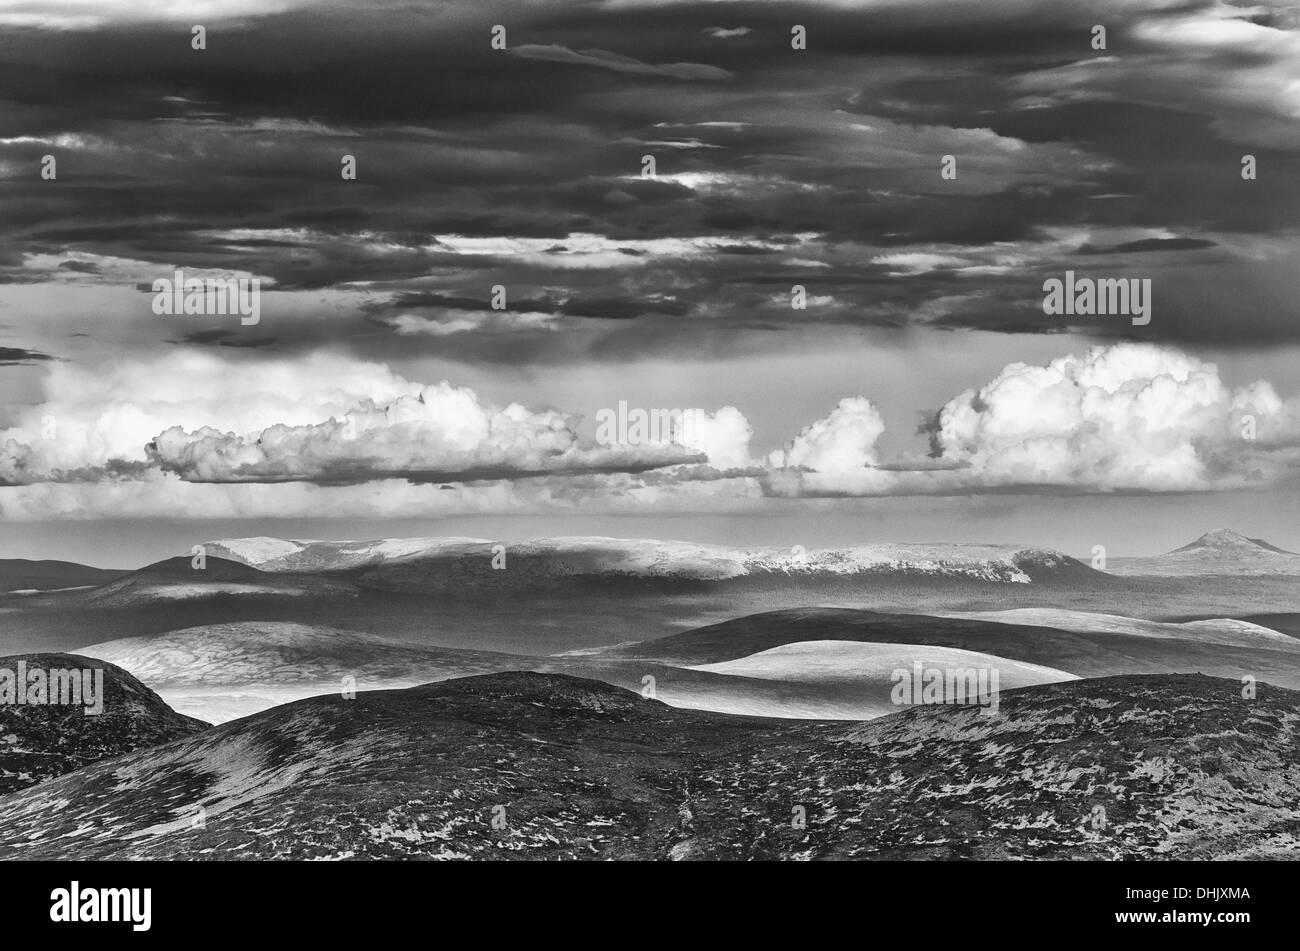 view from Elgahogna, Femundsmarka NP, Norway - Stock Image